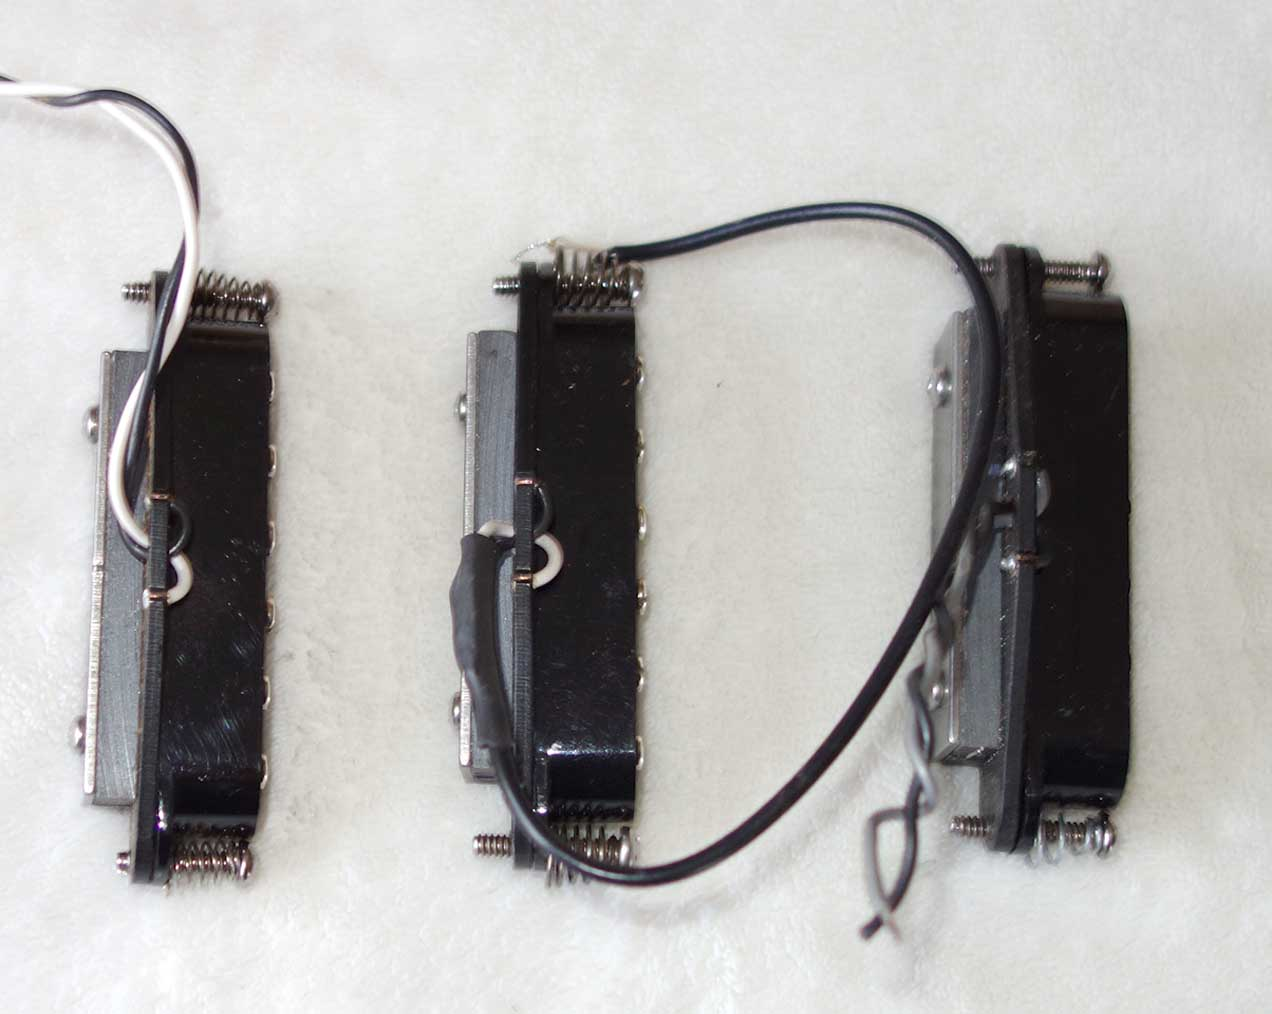 2013 Rio Grande DIRTY HARRY Strat Pickup Set w/P90 Character, Black, 3x PUPS